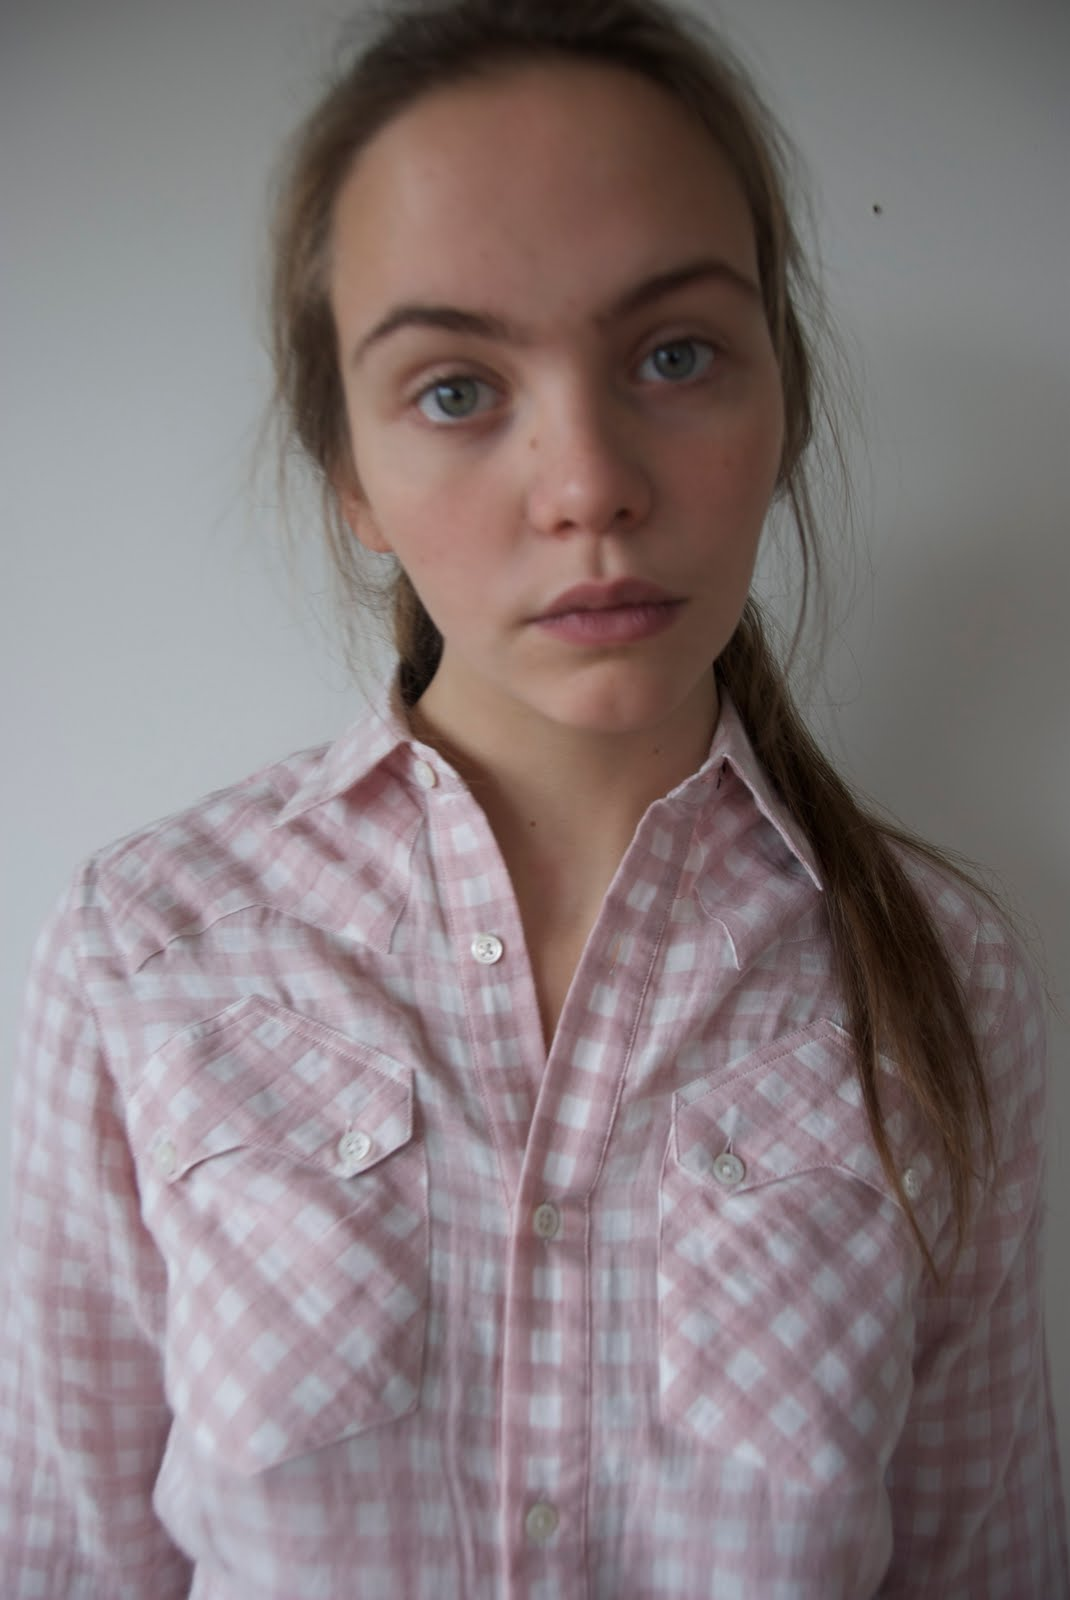 Eija Skarsgard Images & Pictures - Becuo